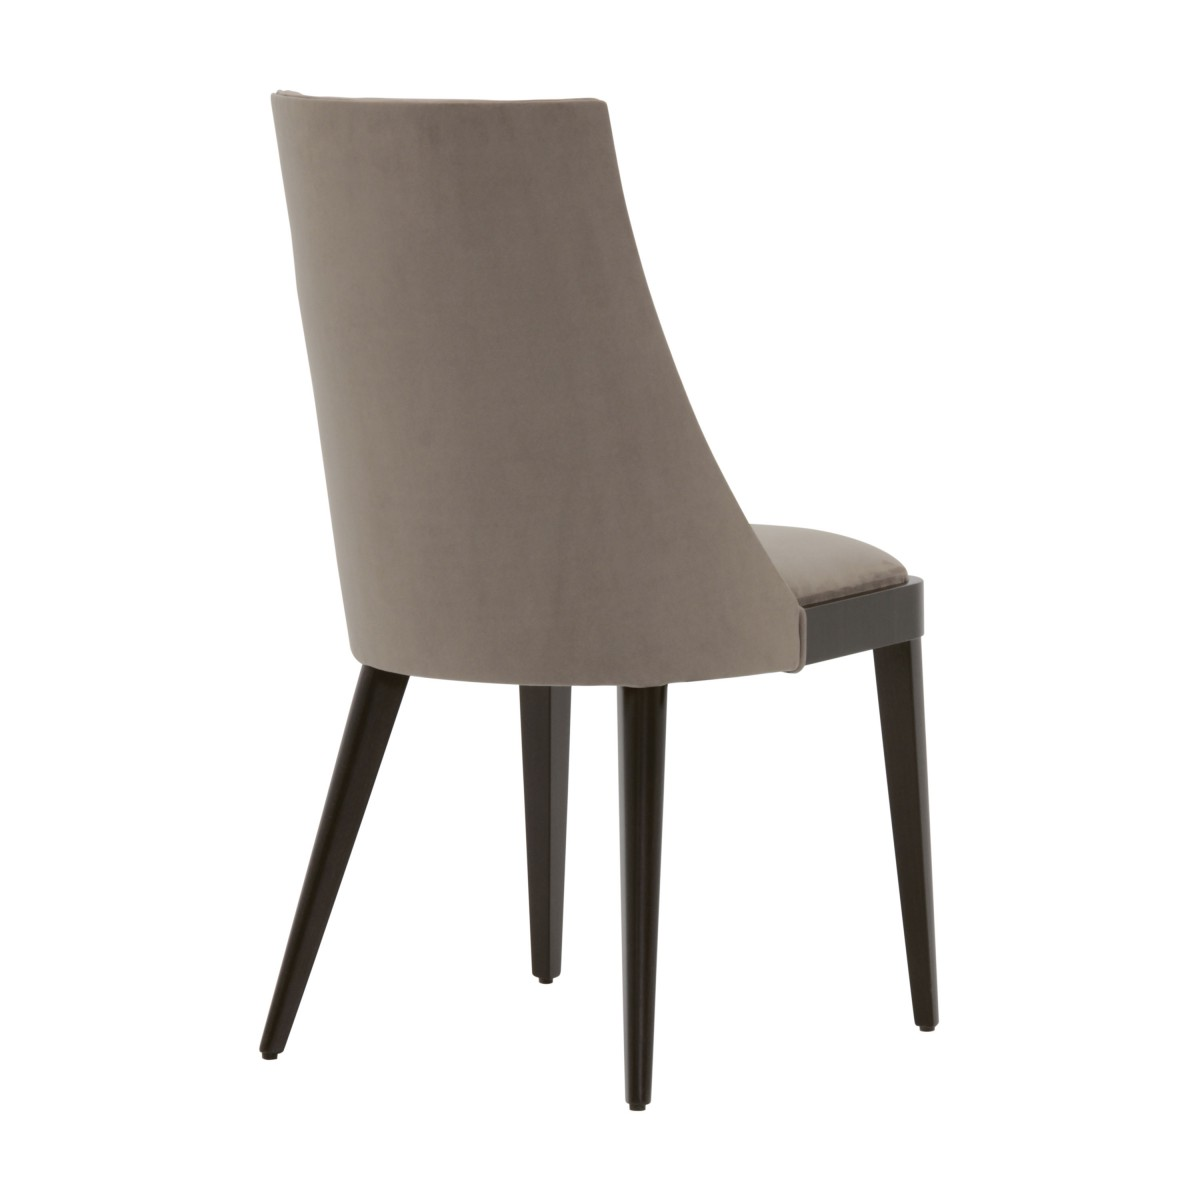 modern chair norvegia 1 8797